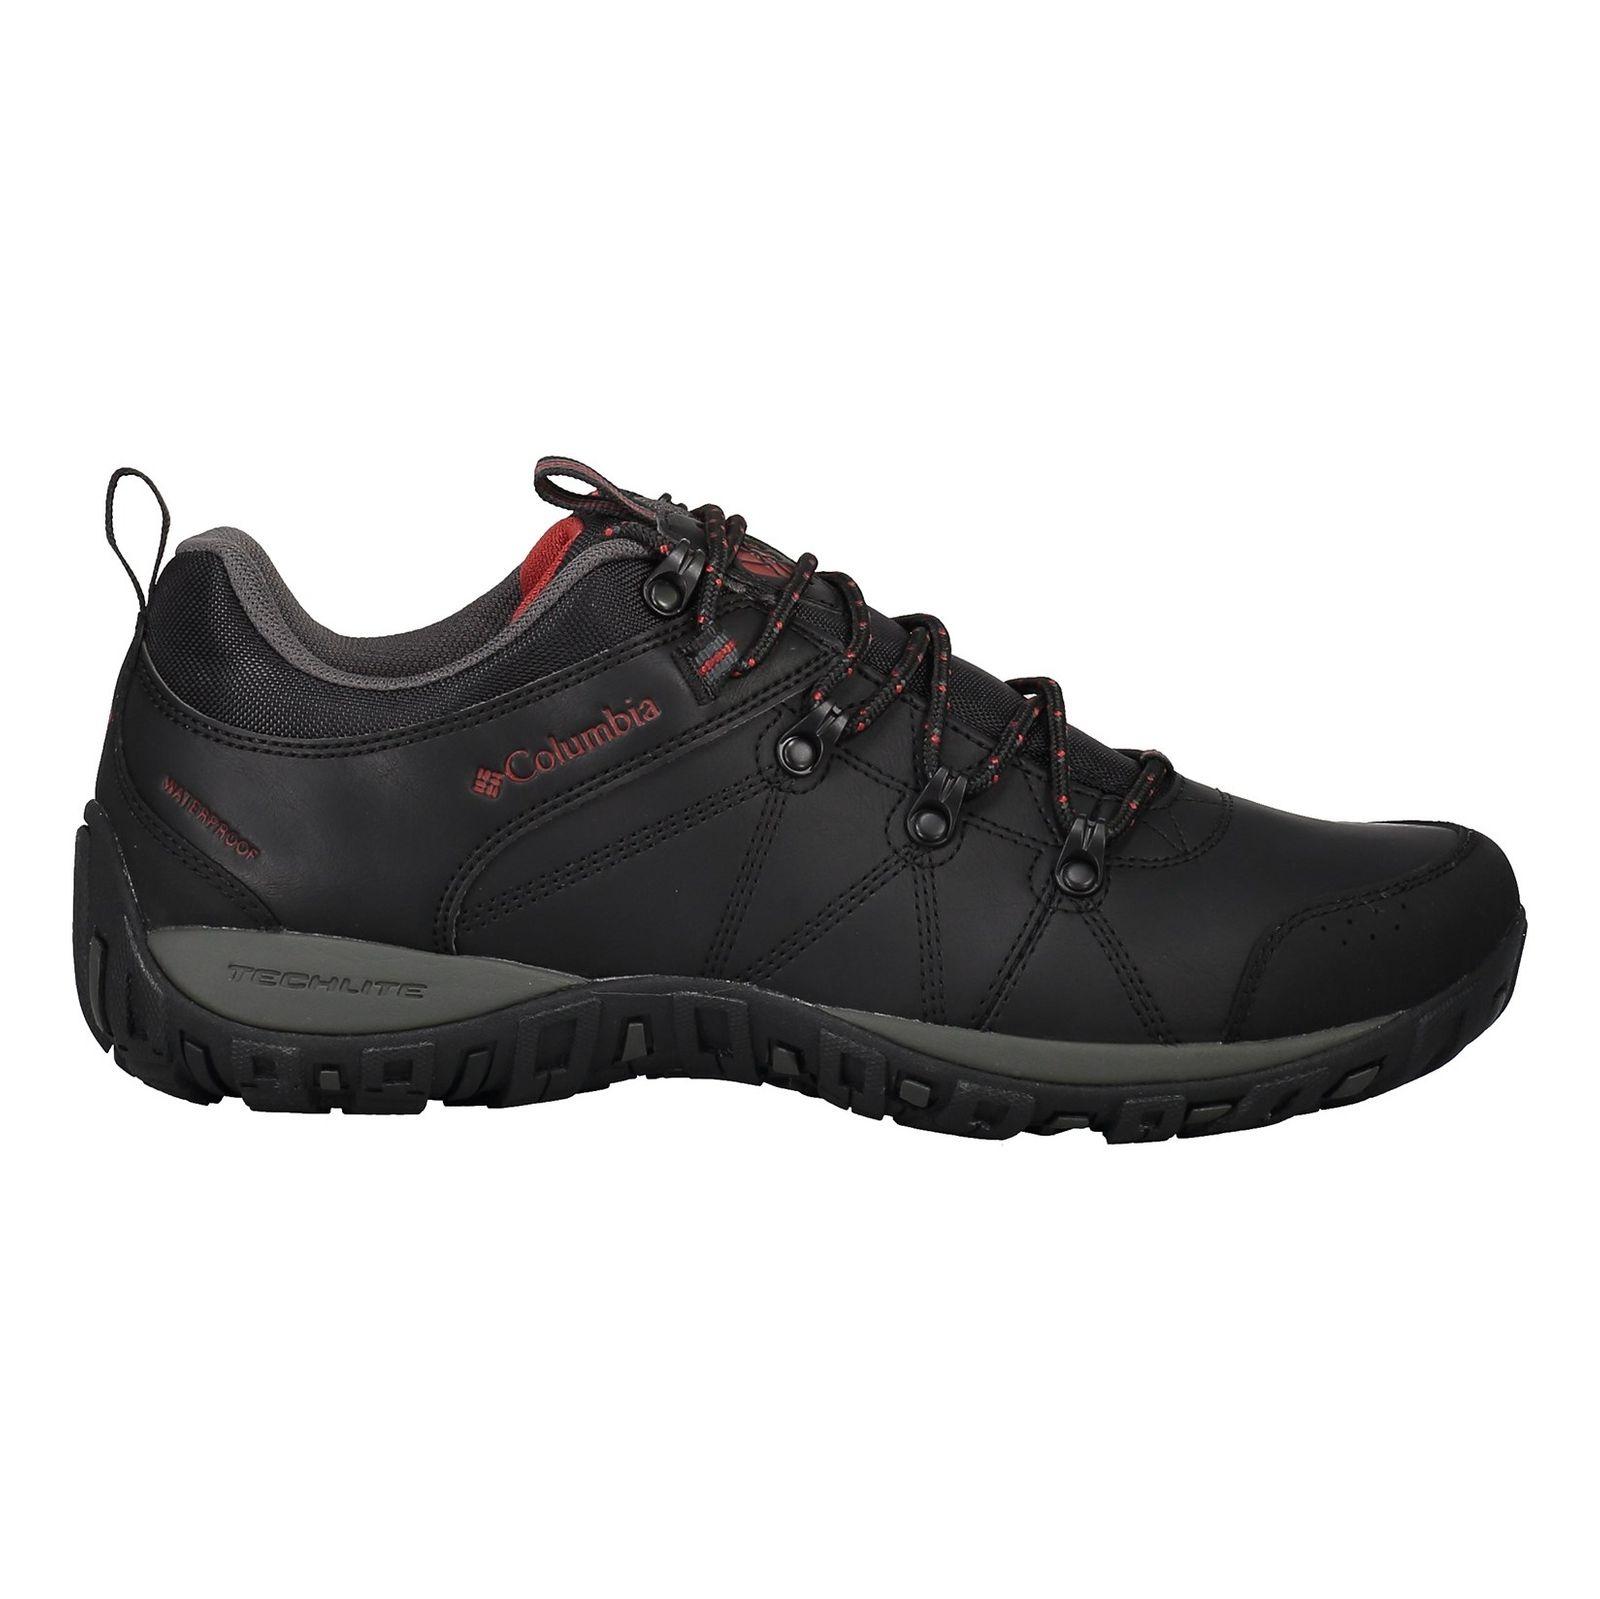 کفش طبیعت گردی بندی مردانه Peakfreak Venture - کلمبیا - مشکي - 1